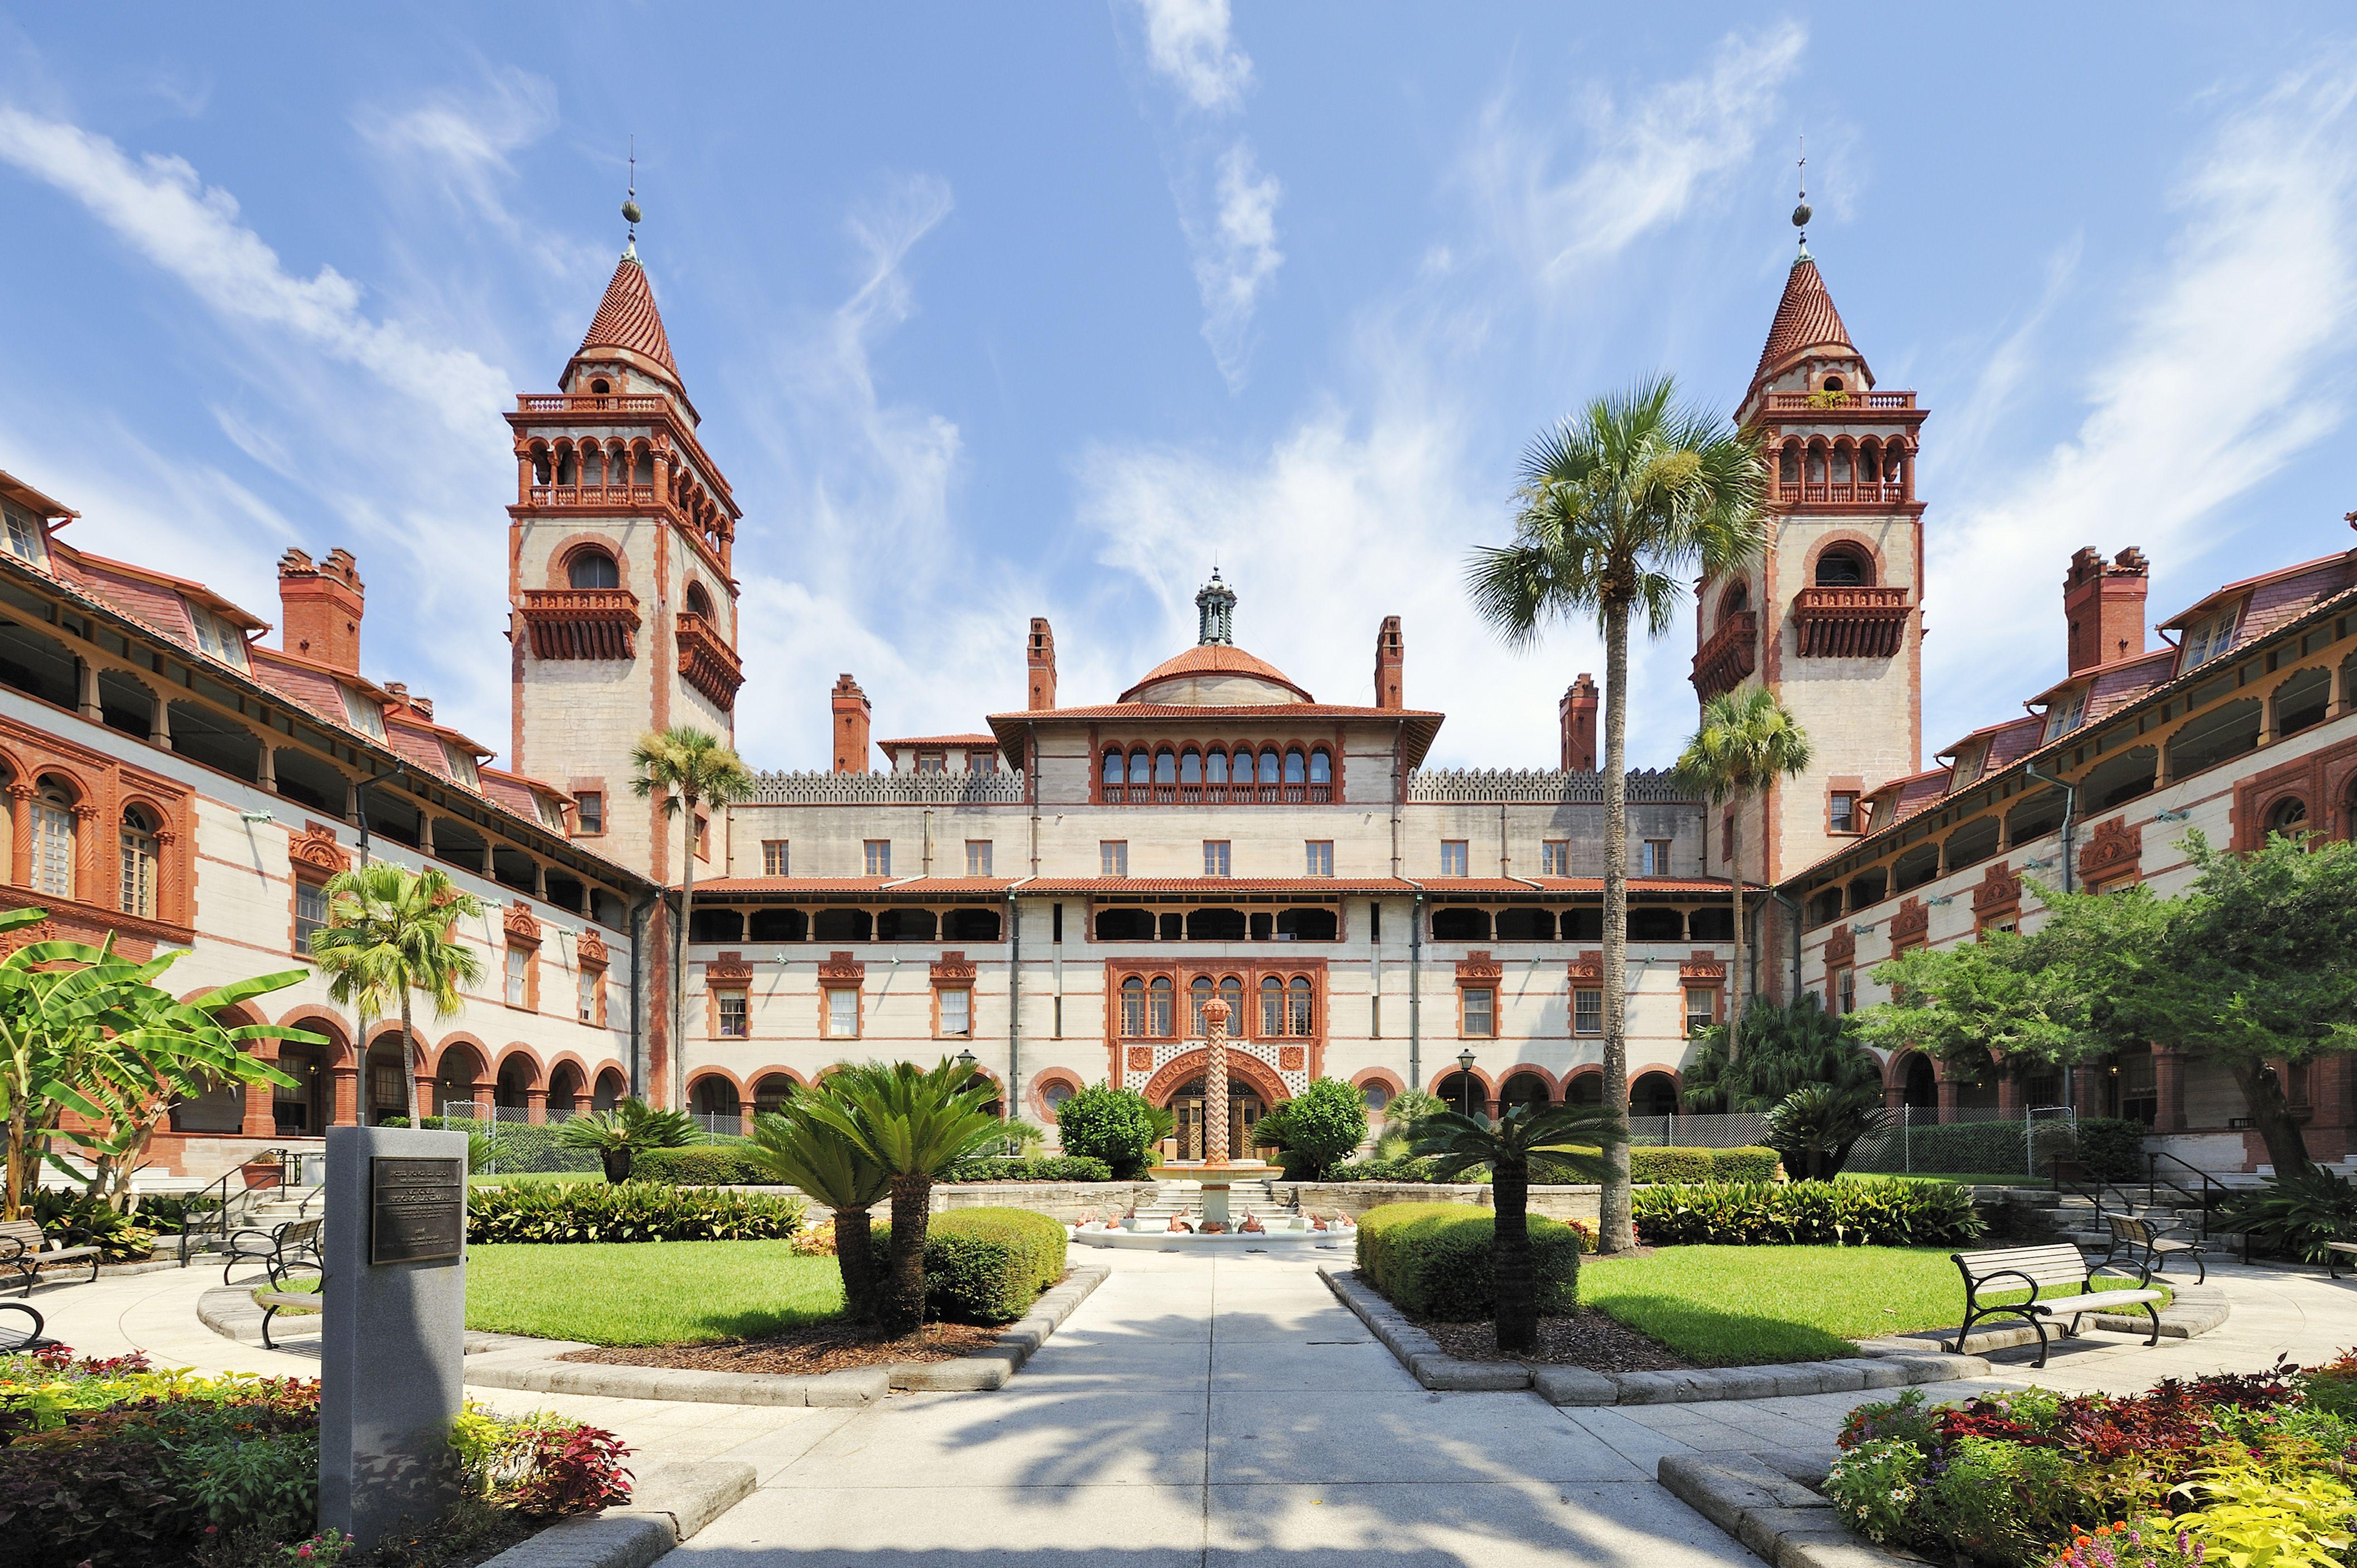 USA, Florida, St. Augustine, Ponce de Leon Hall of Flagler College